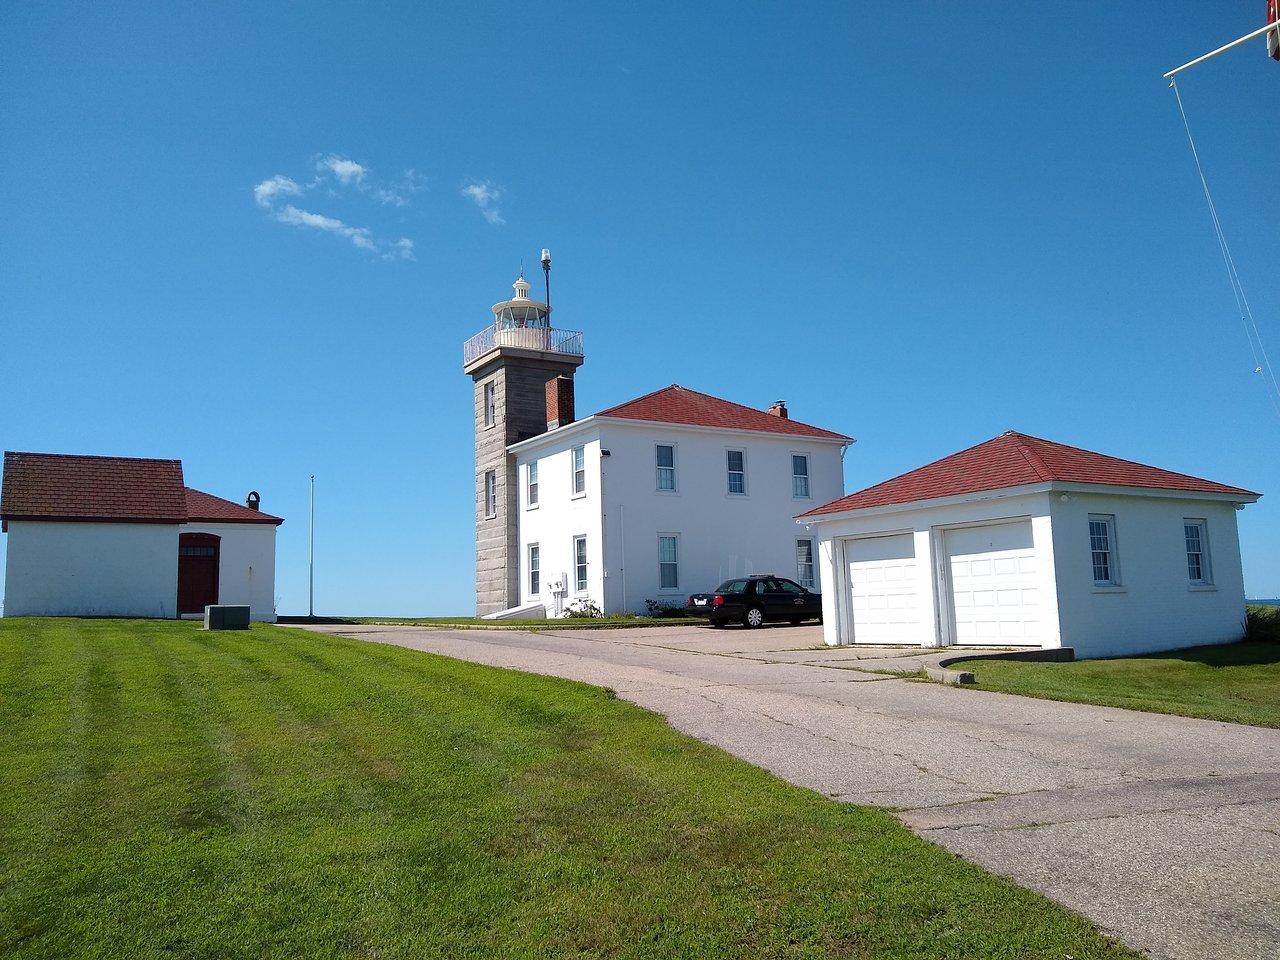 Watch Hill Lighthouse 2020 Ce Qu Il